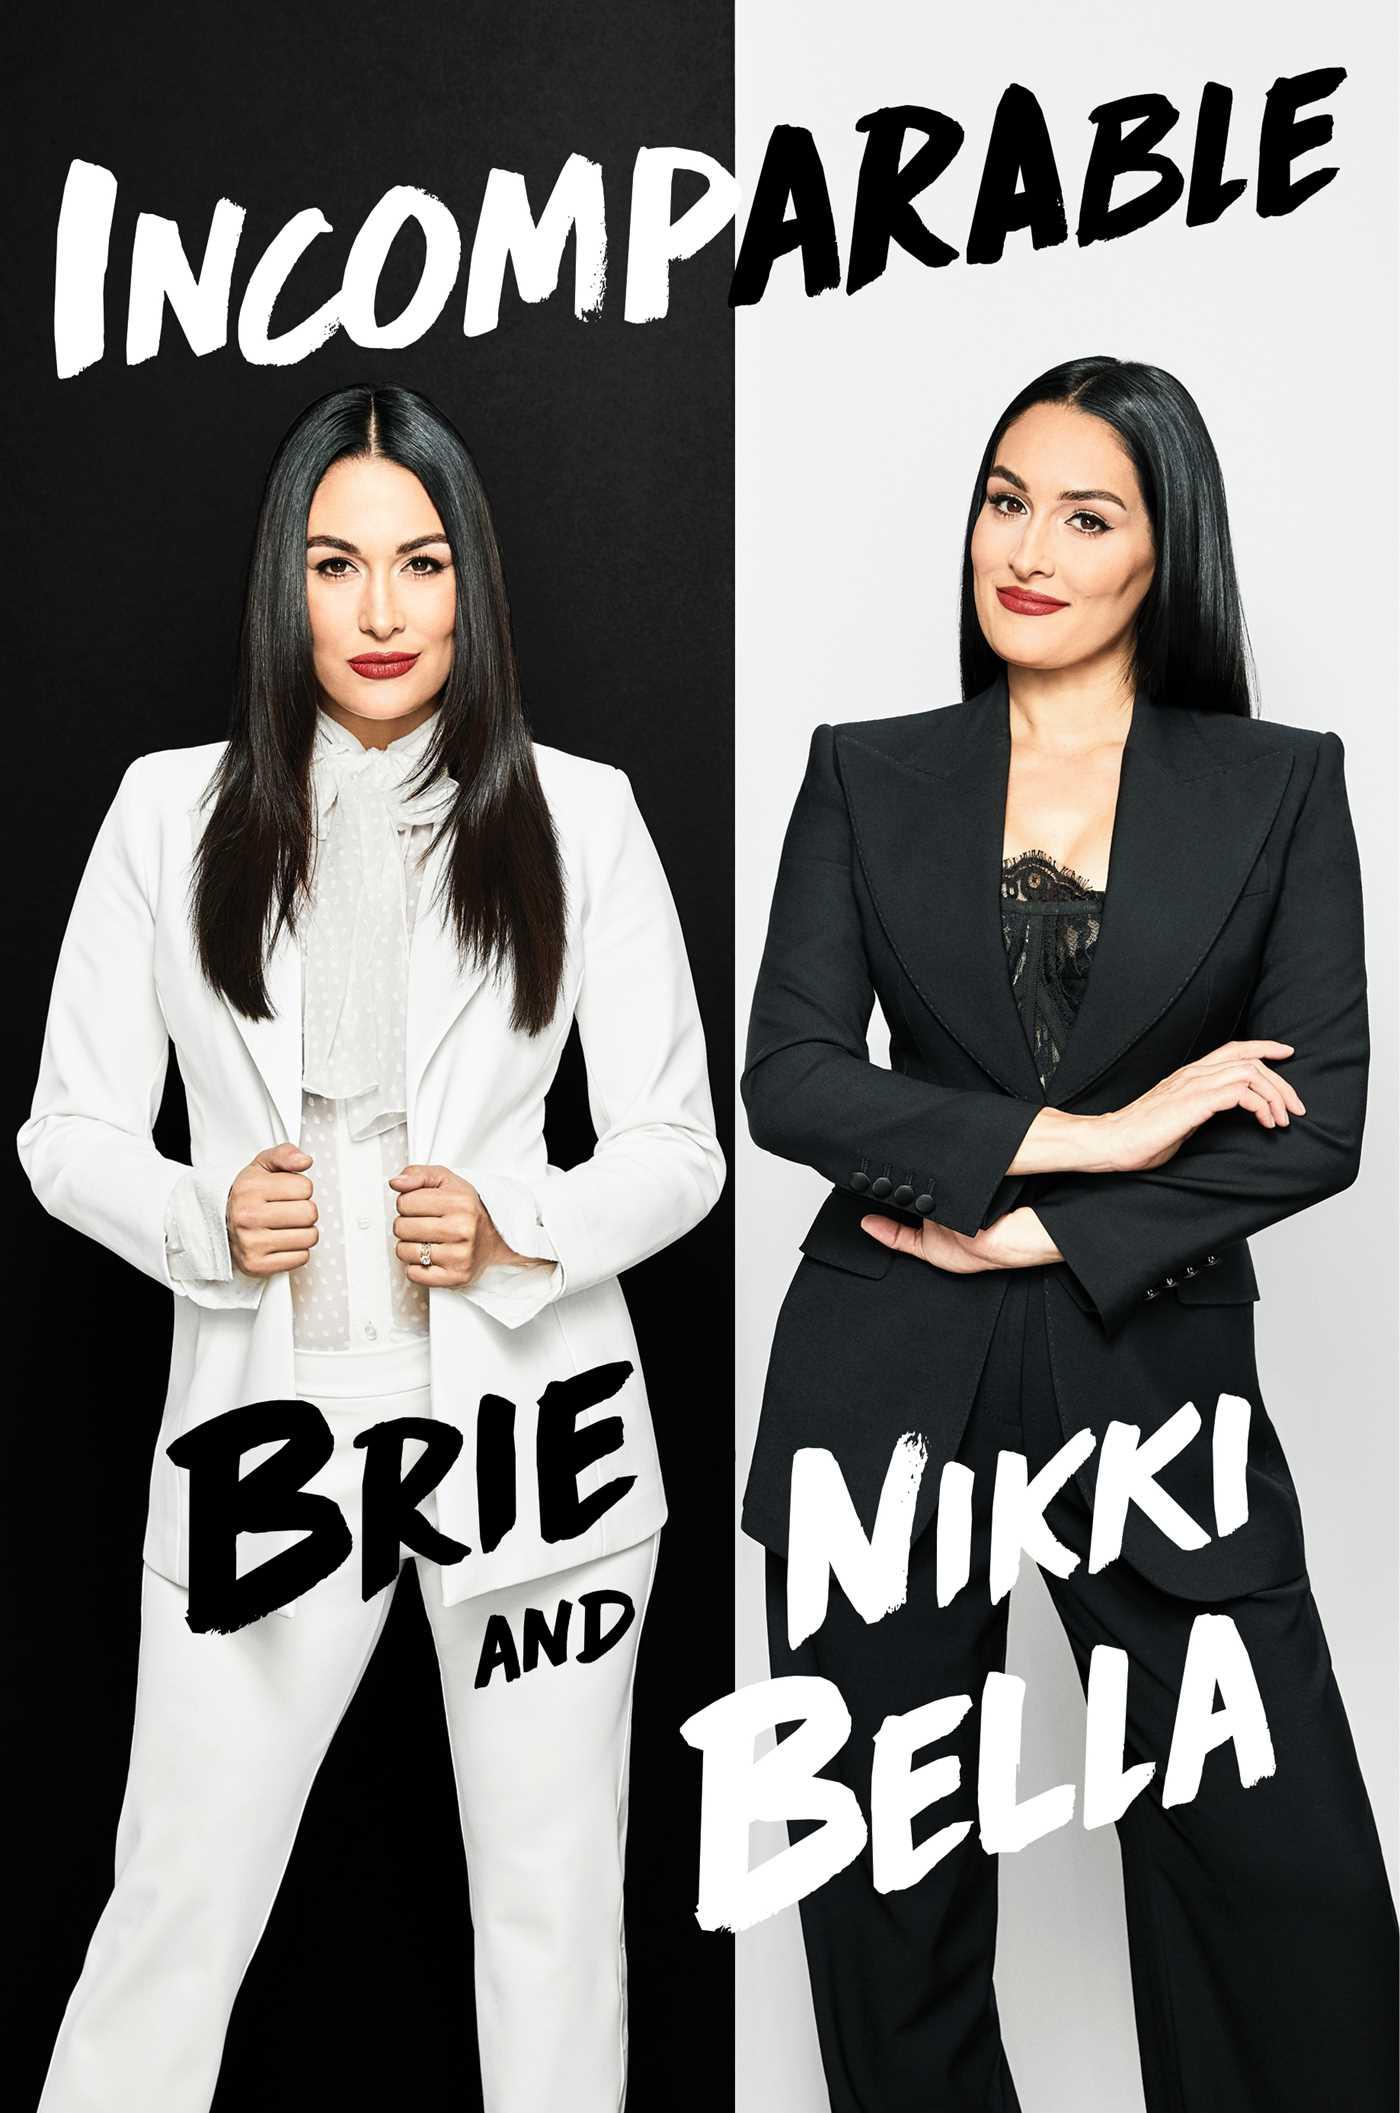 Incomparable by Nikki Bella, Brie Bella